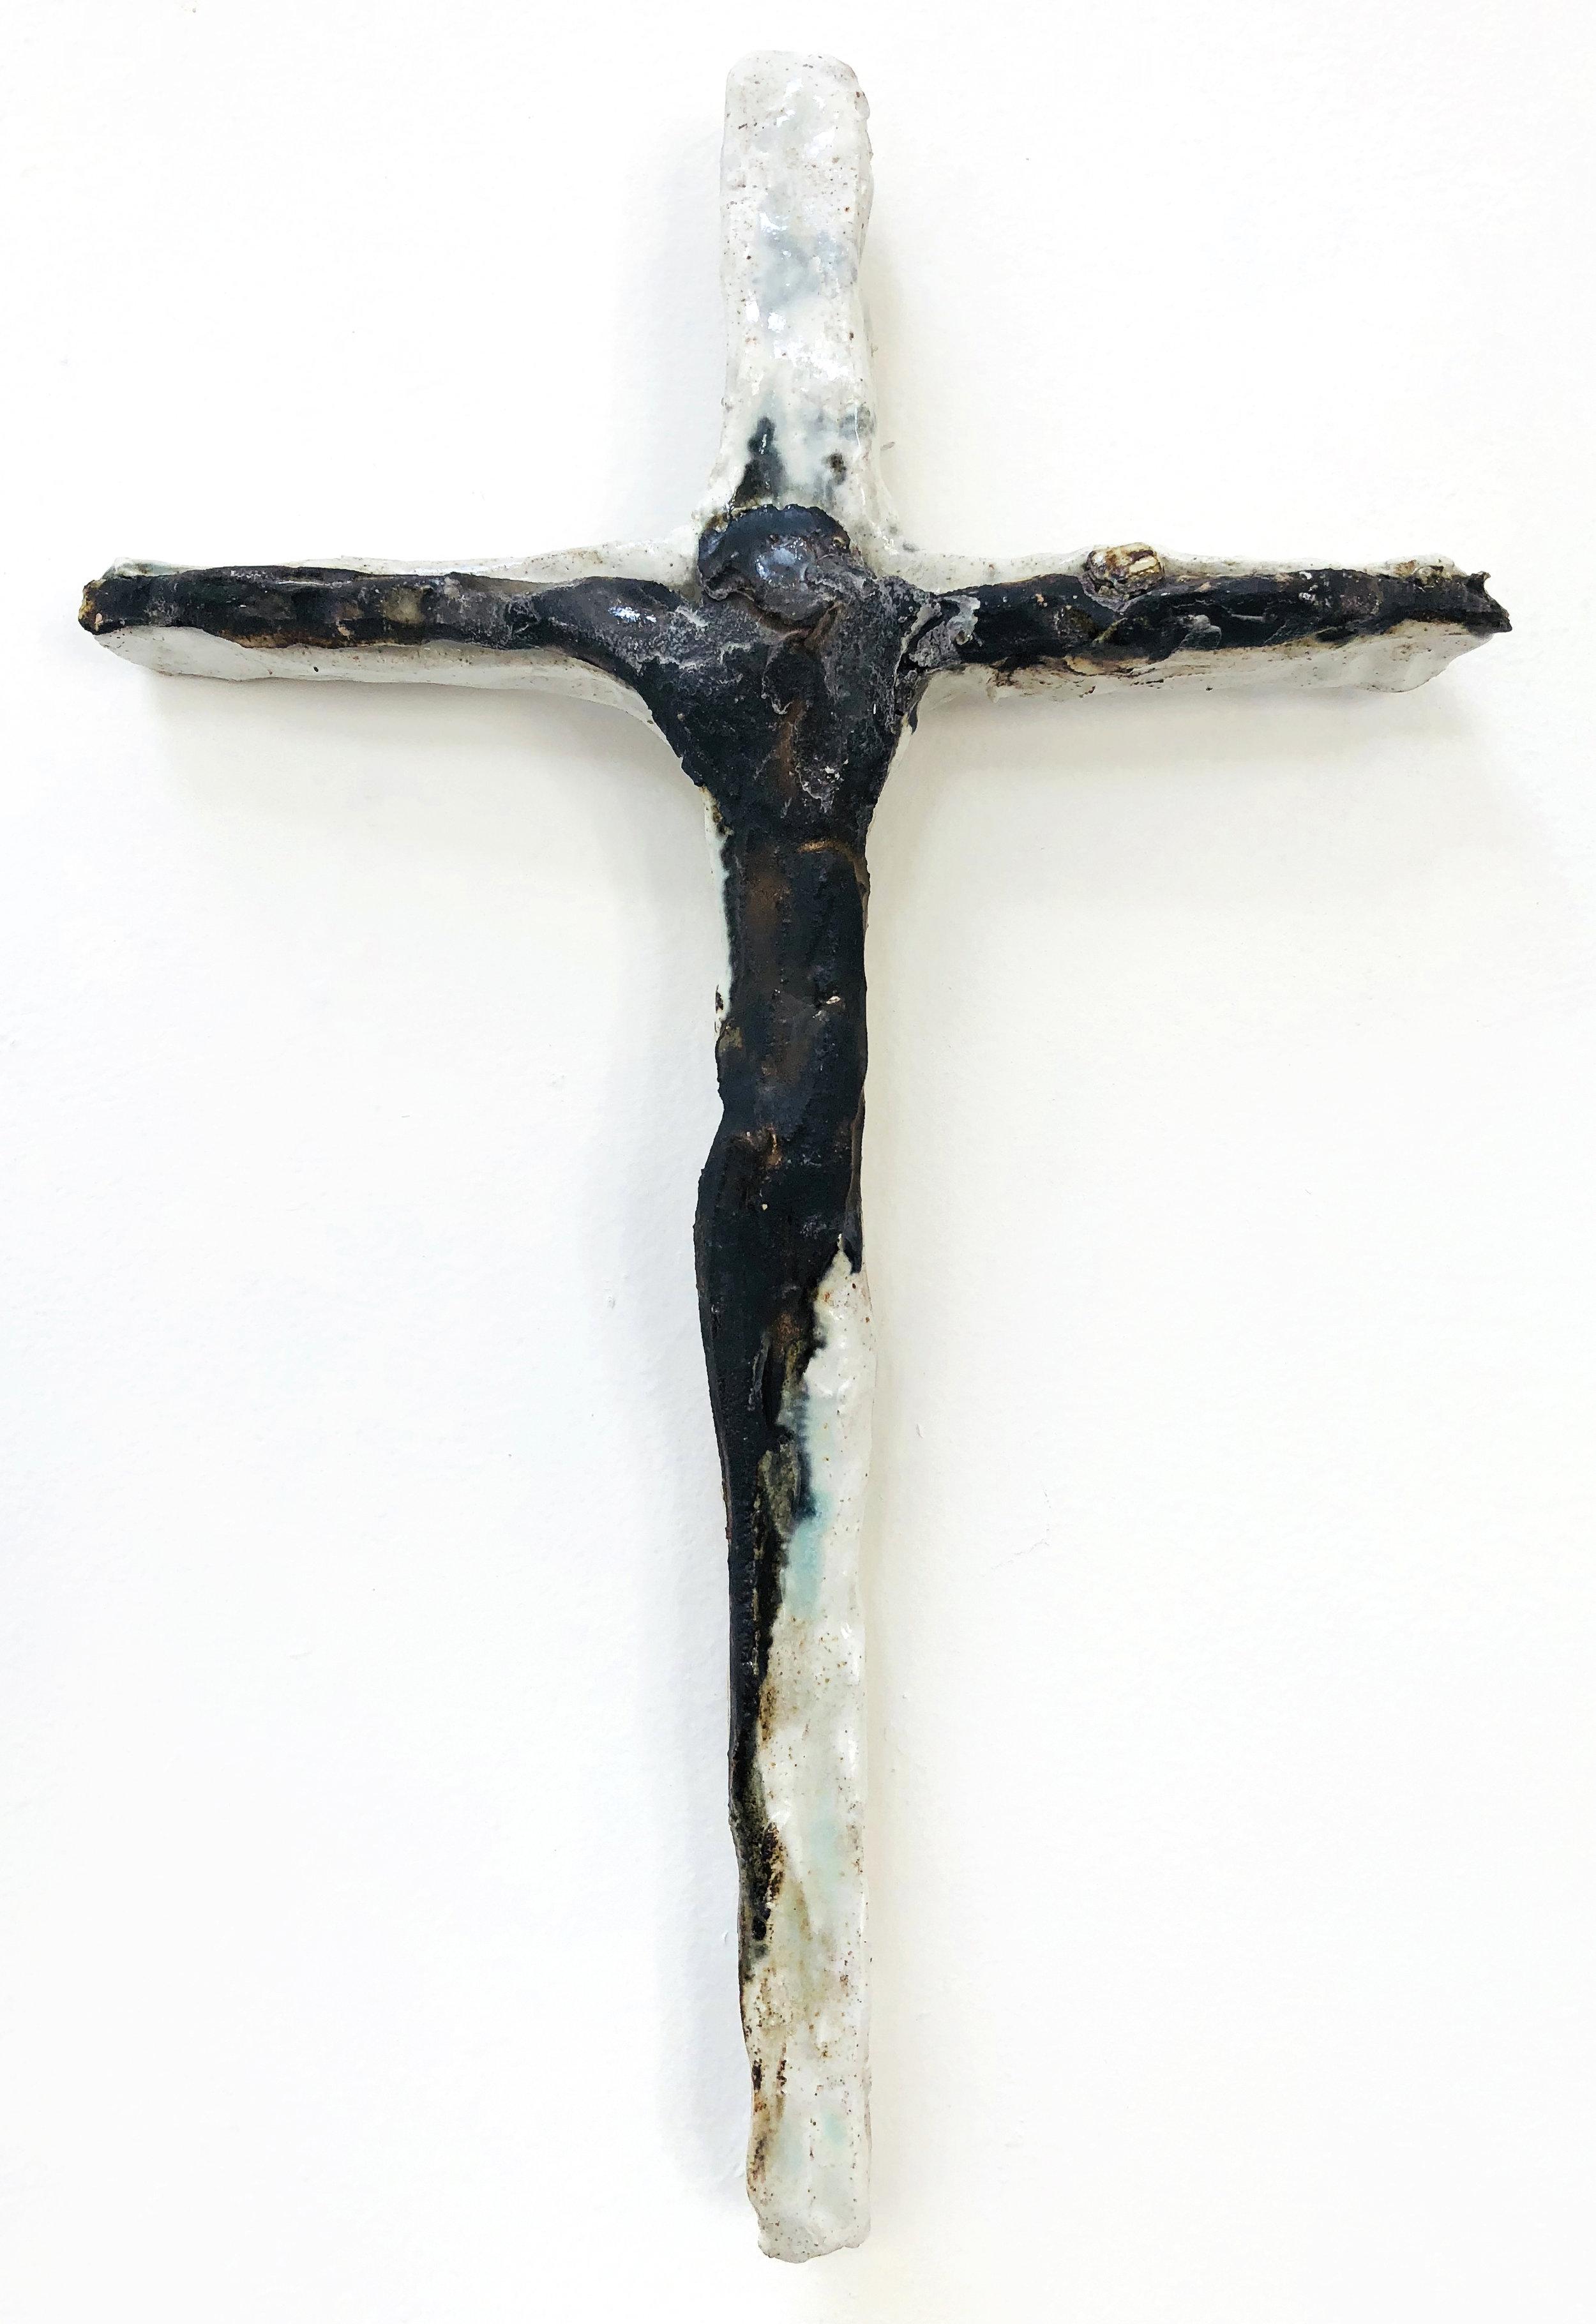 24-240x180-$1500-RichardLewer-Crucifix.jpg